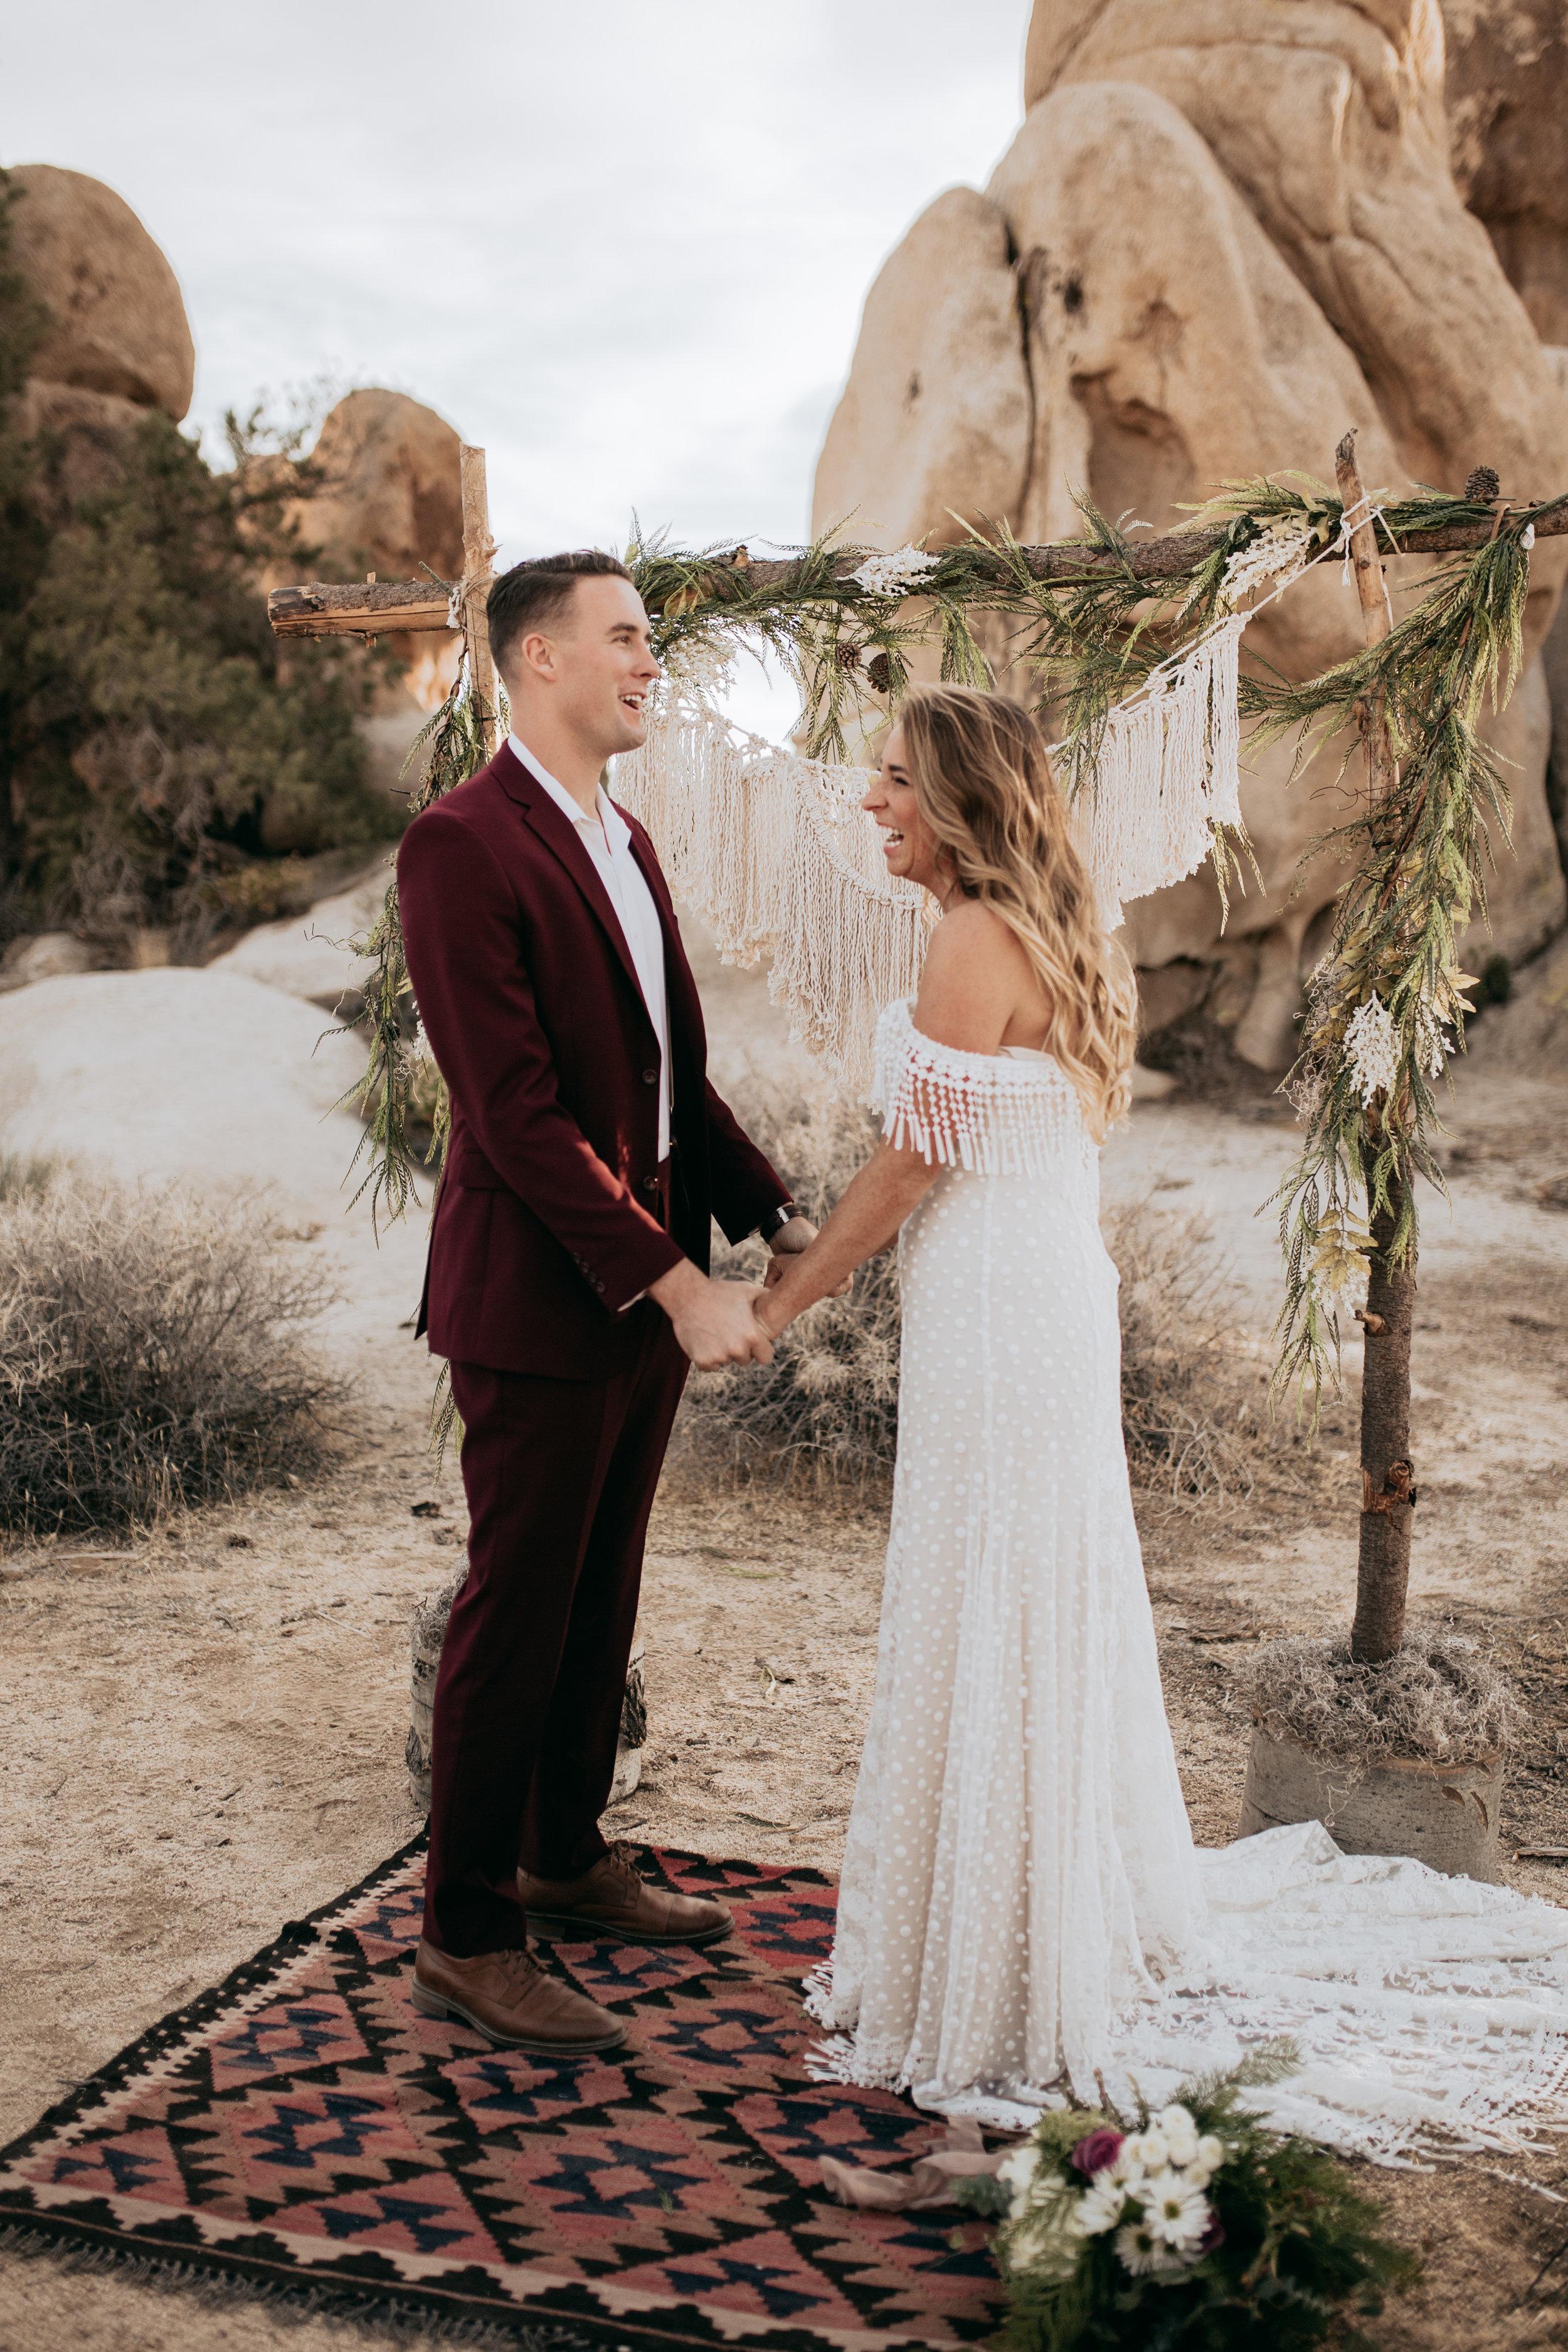 palmsprings_joshuatree_california_wedding_photographer-11.jpg